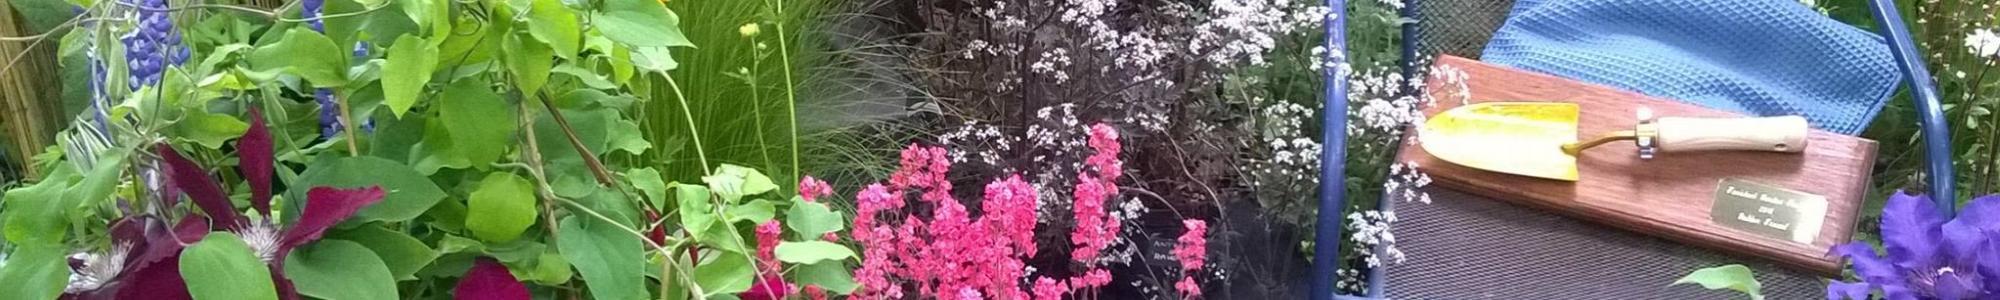 Tavistock Garden Festival Display Garden